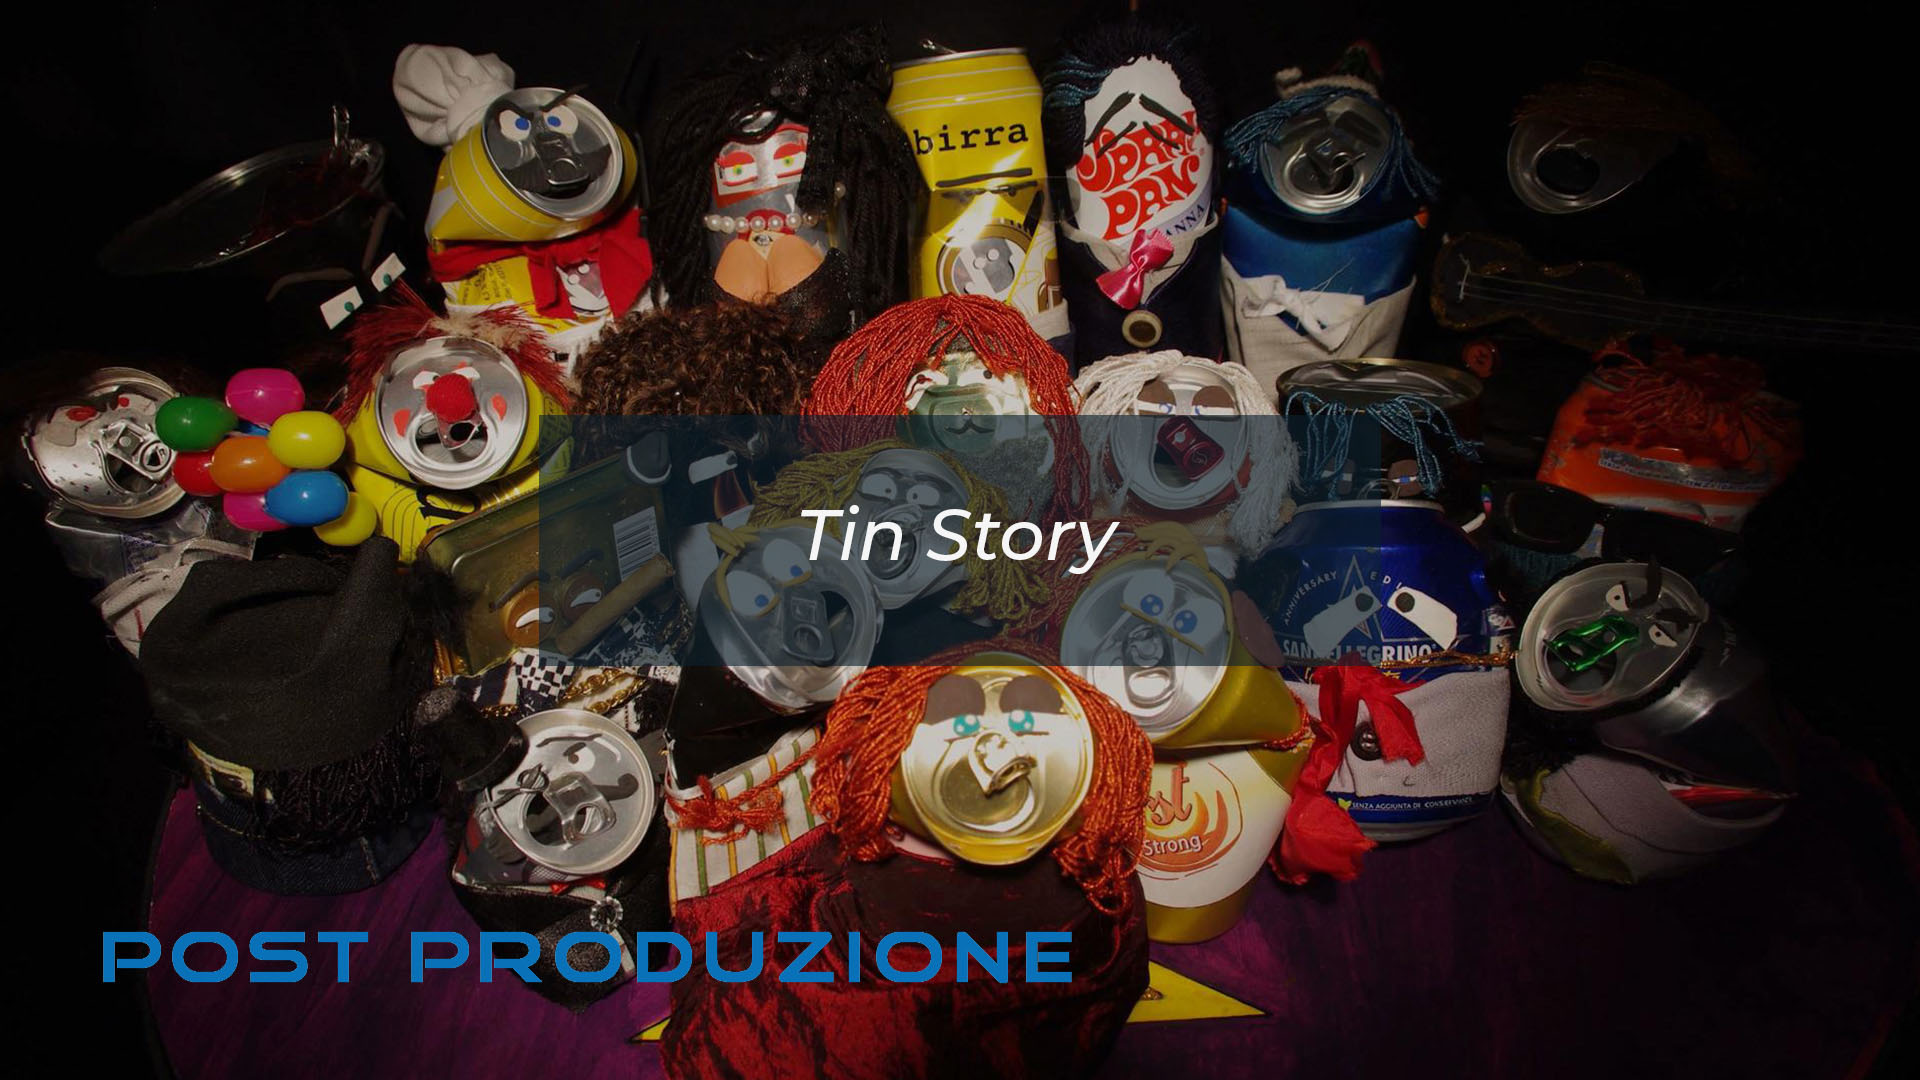 Post Produzione Tin Story by DiMMD